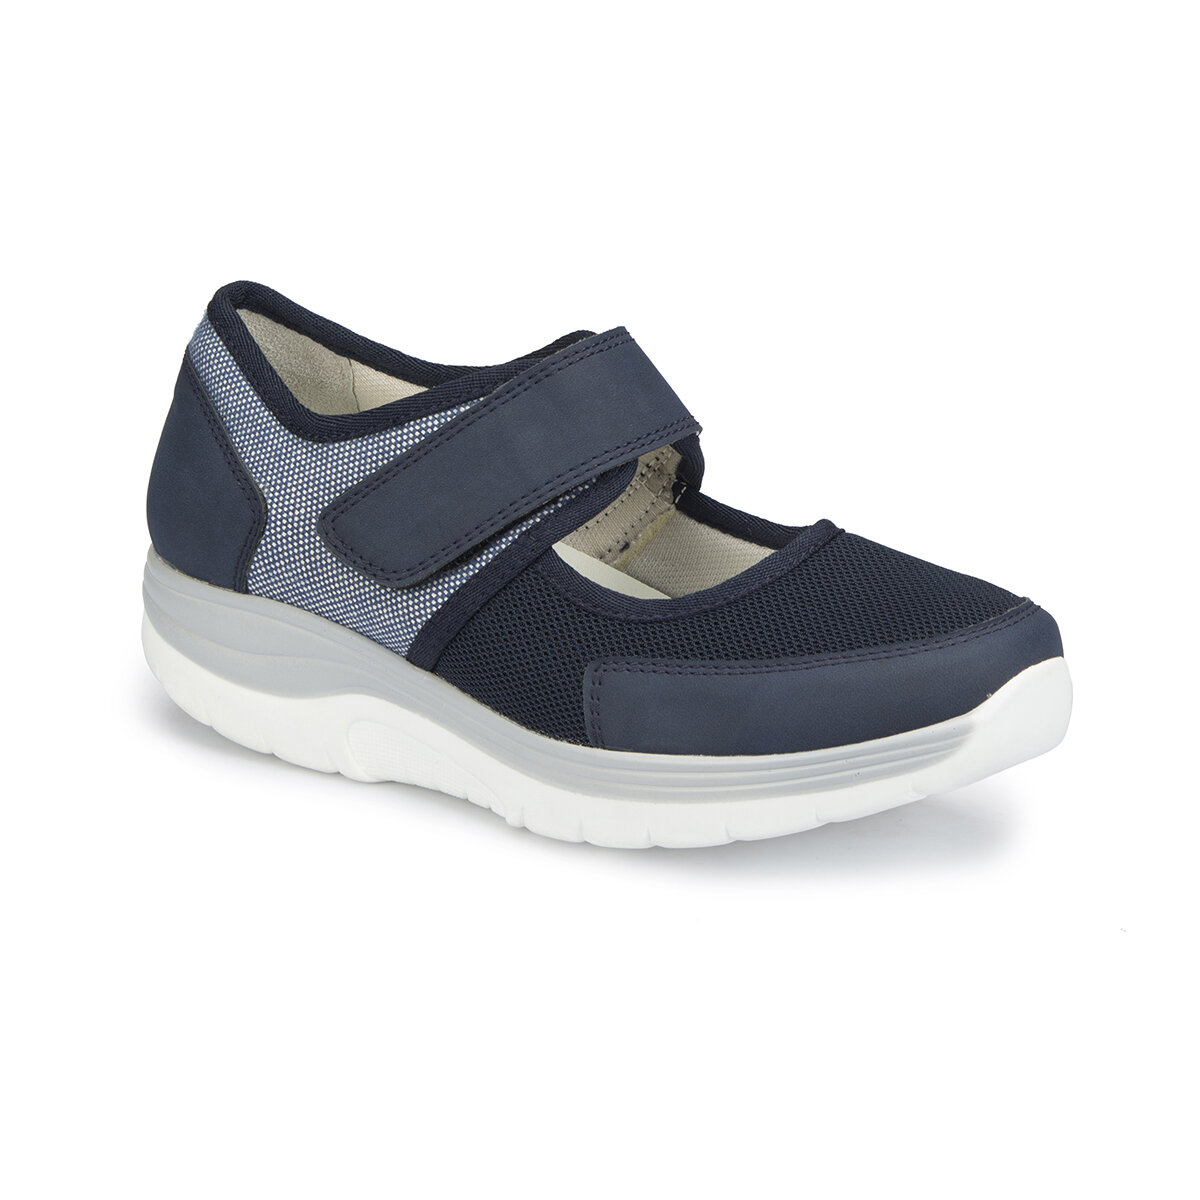 FLO 81.111297.Z Navy Blue Women Basic Comfort Polaris